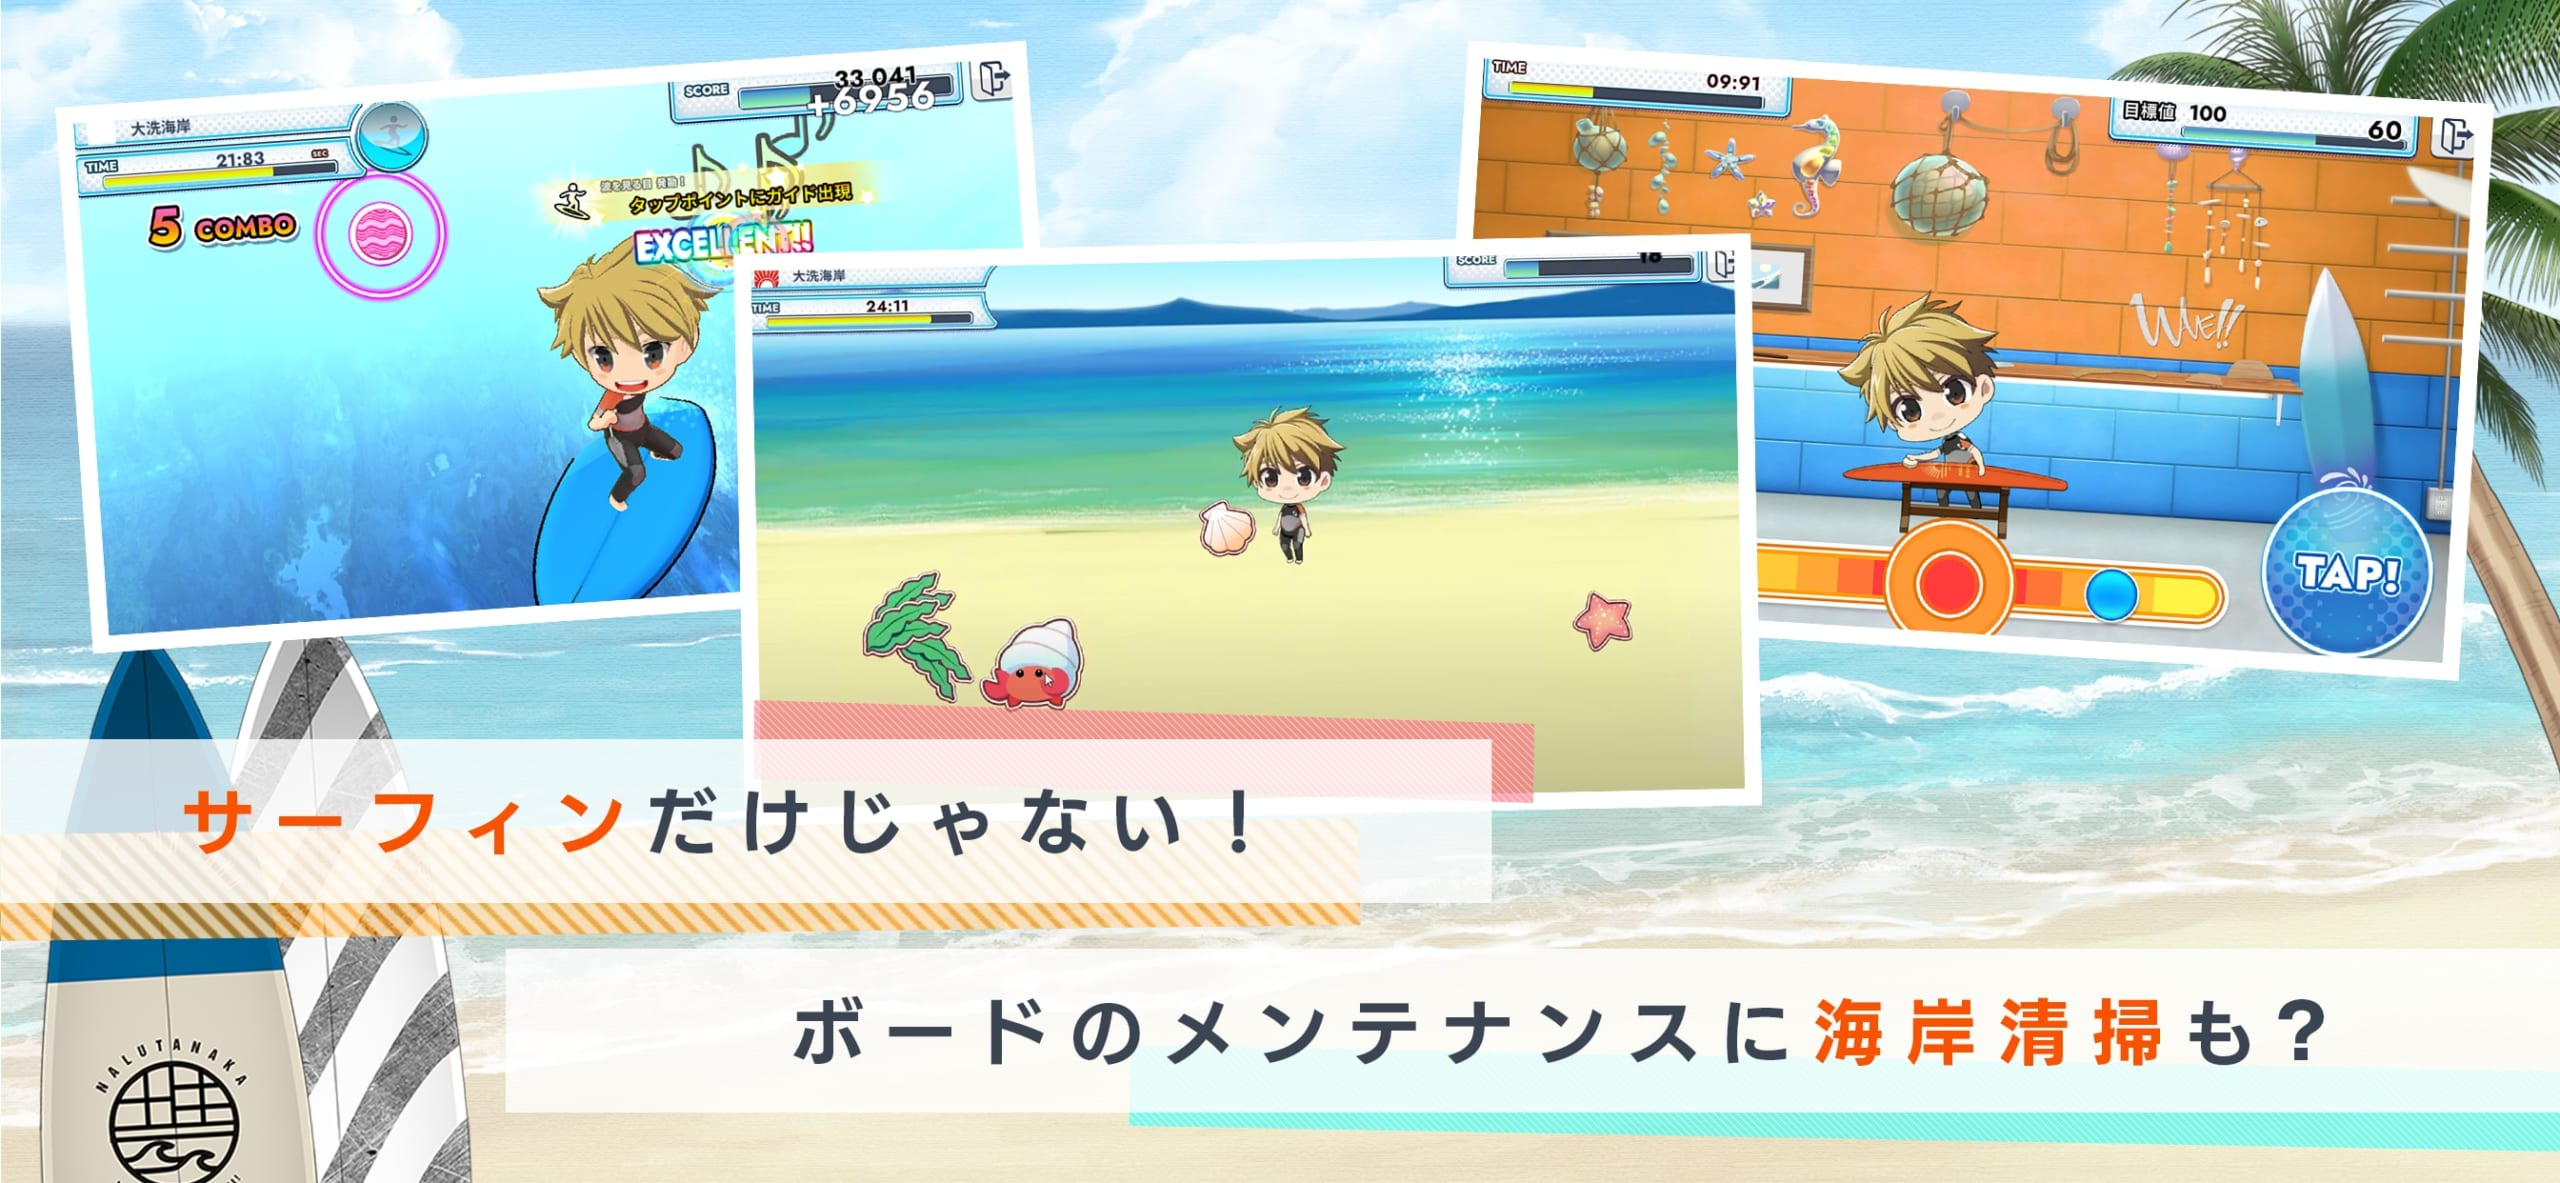 「WAVE!!〜波乗りボーイズ〜」ゲーム画面4